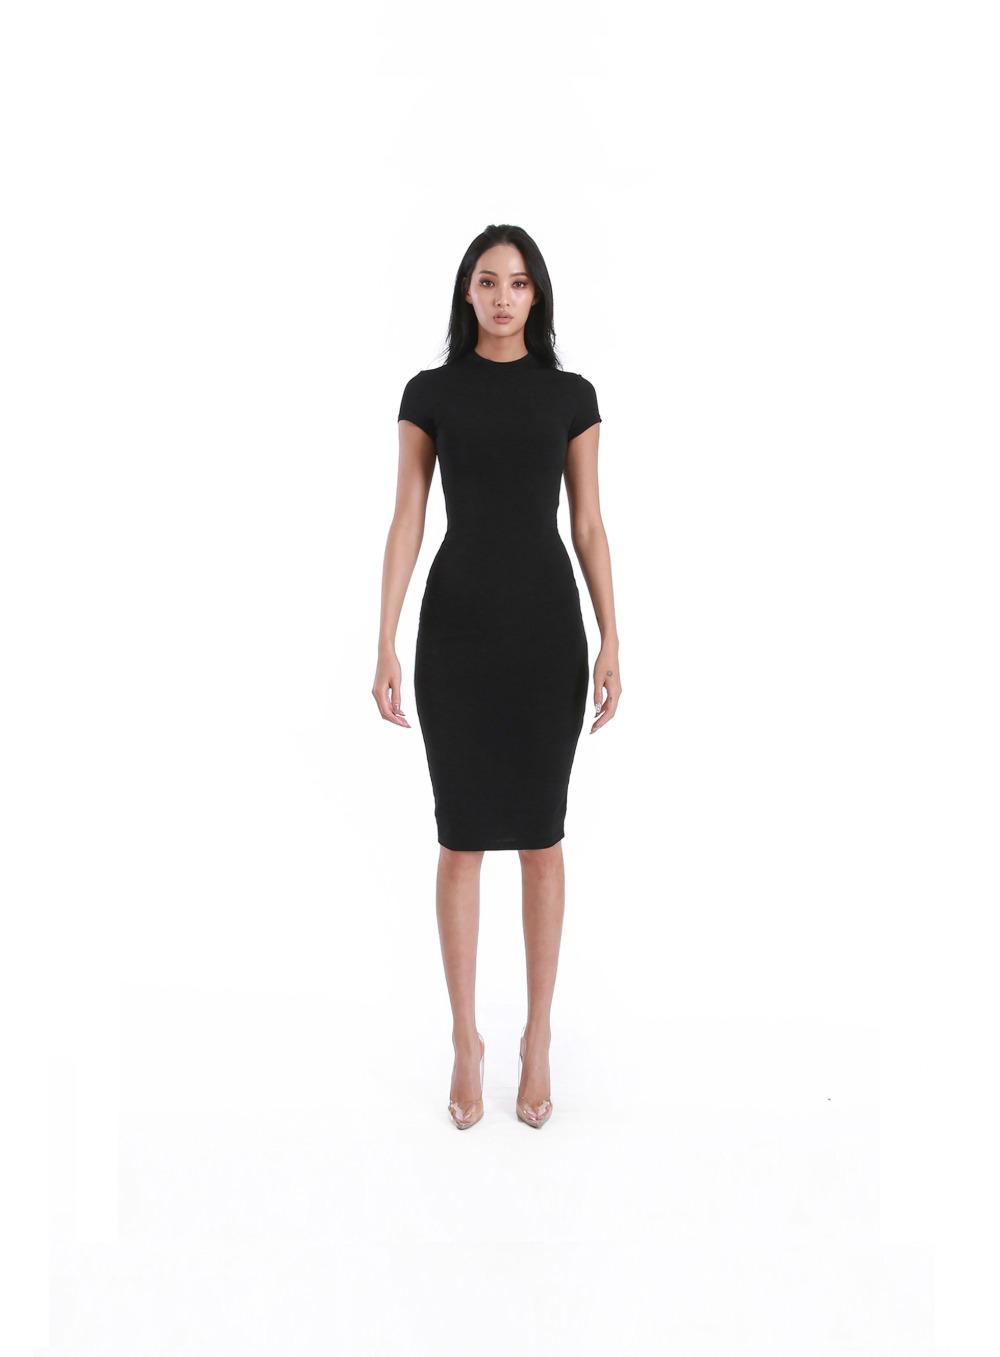 LAWRENCE DRESS - BLACK 로렌스 드레스